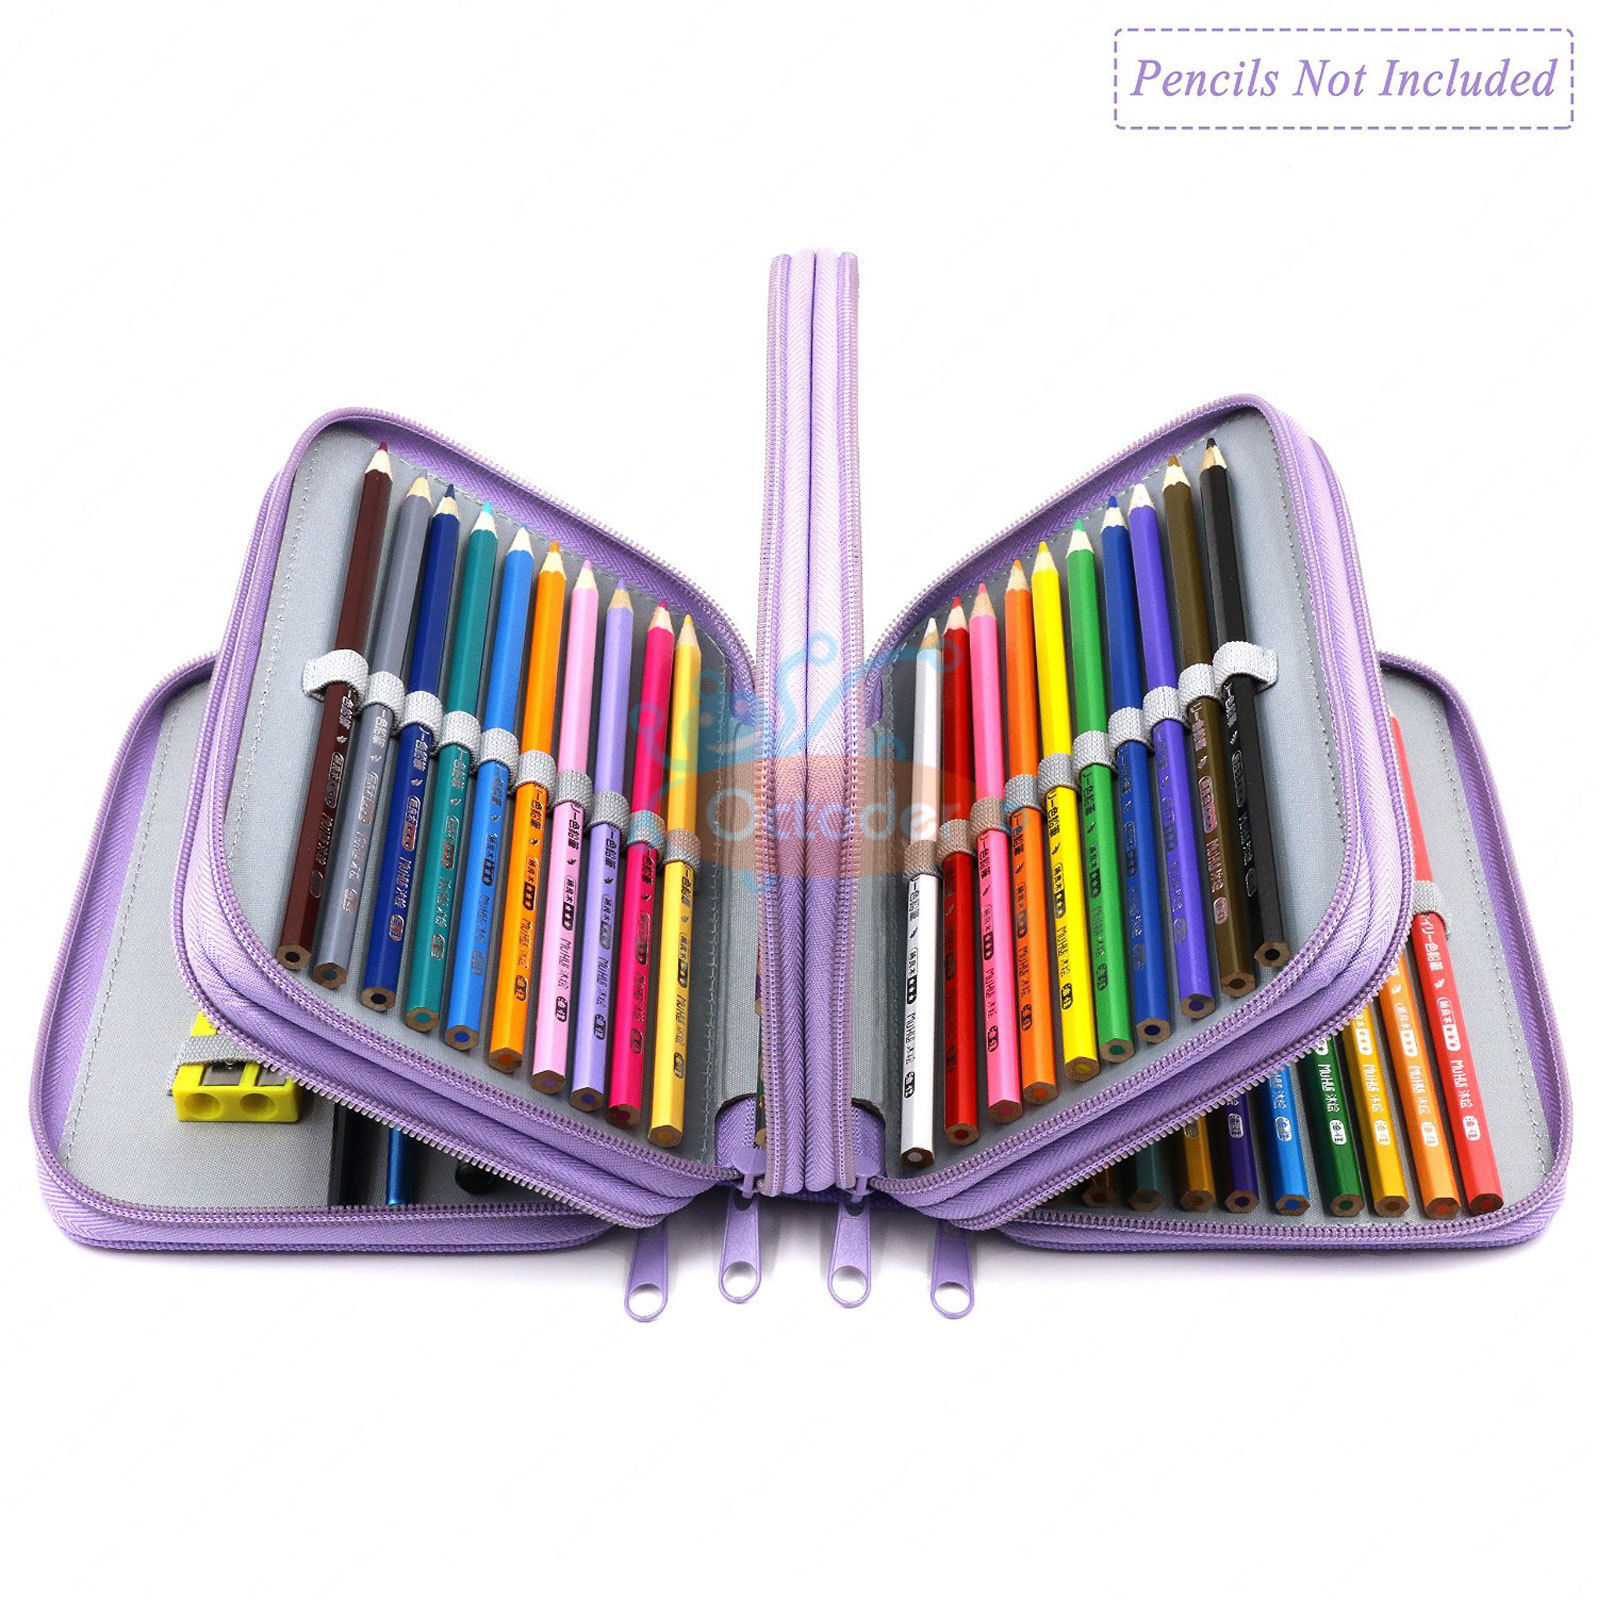 4-Layers-High-Capacity-Pencil-Brush-Case-Box-Pen-Pouch-Bag-Makeup-Storage-Bag thumbnail 26